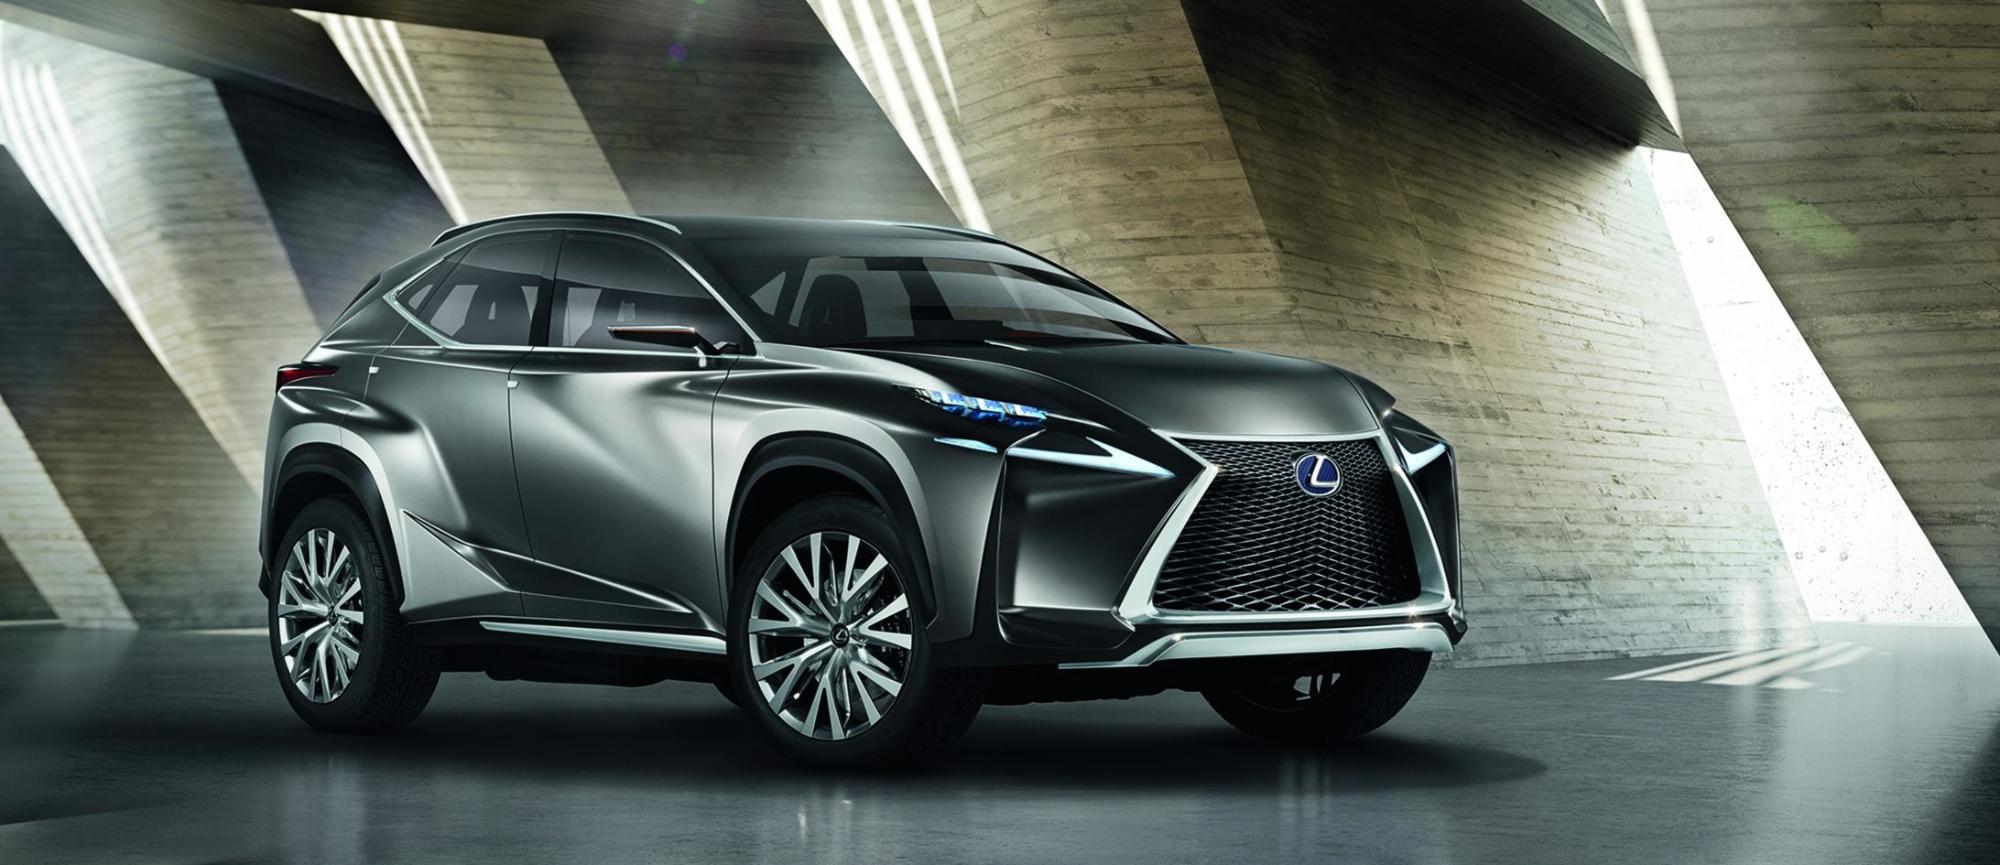 2017 Lexus Lf Nx Crossover Concept